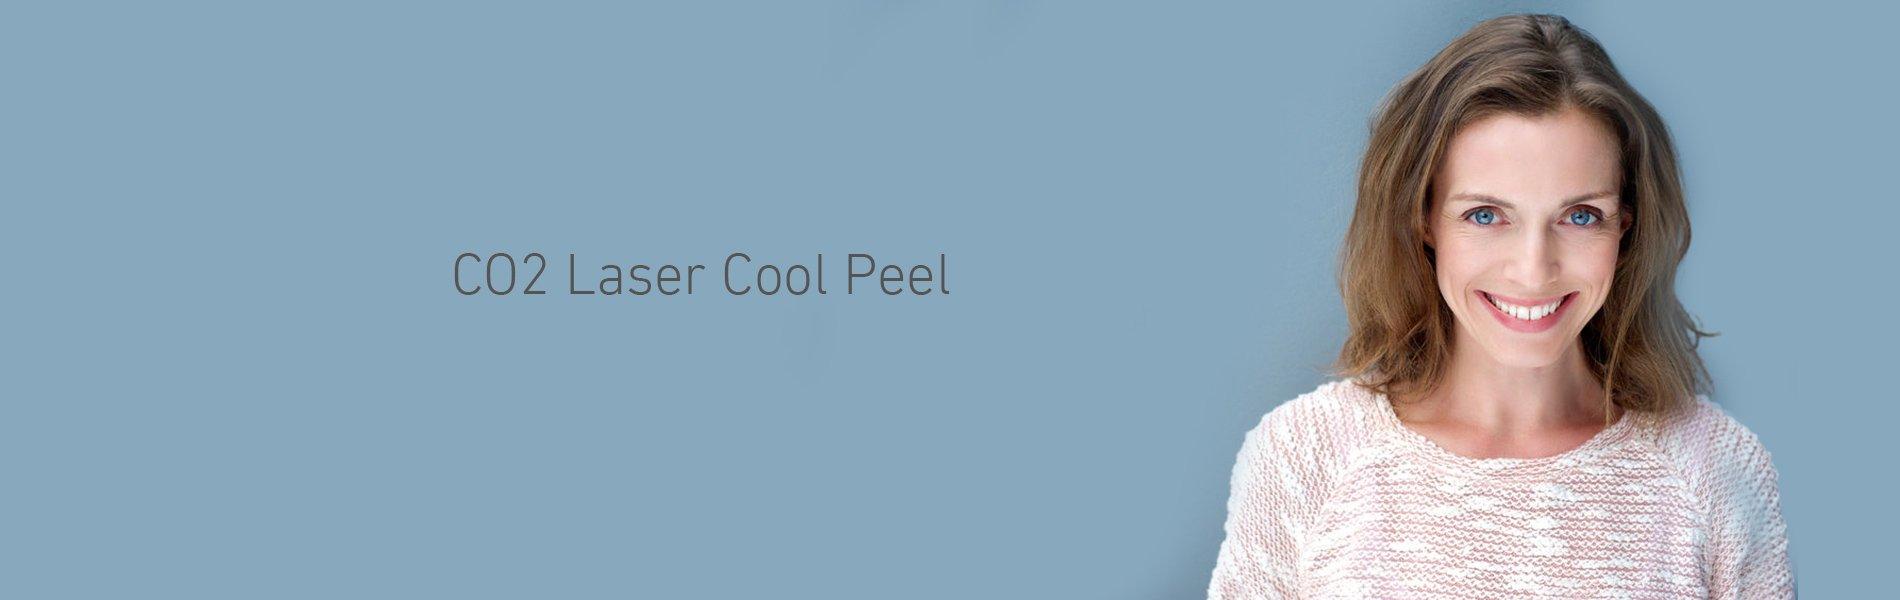 CO2 Laser Cool Peel Anti-Wrinkle Treatments CJA Aesthetics Clinics Southampton